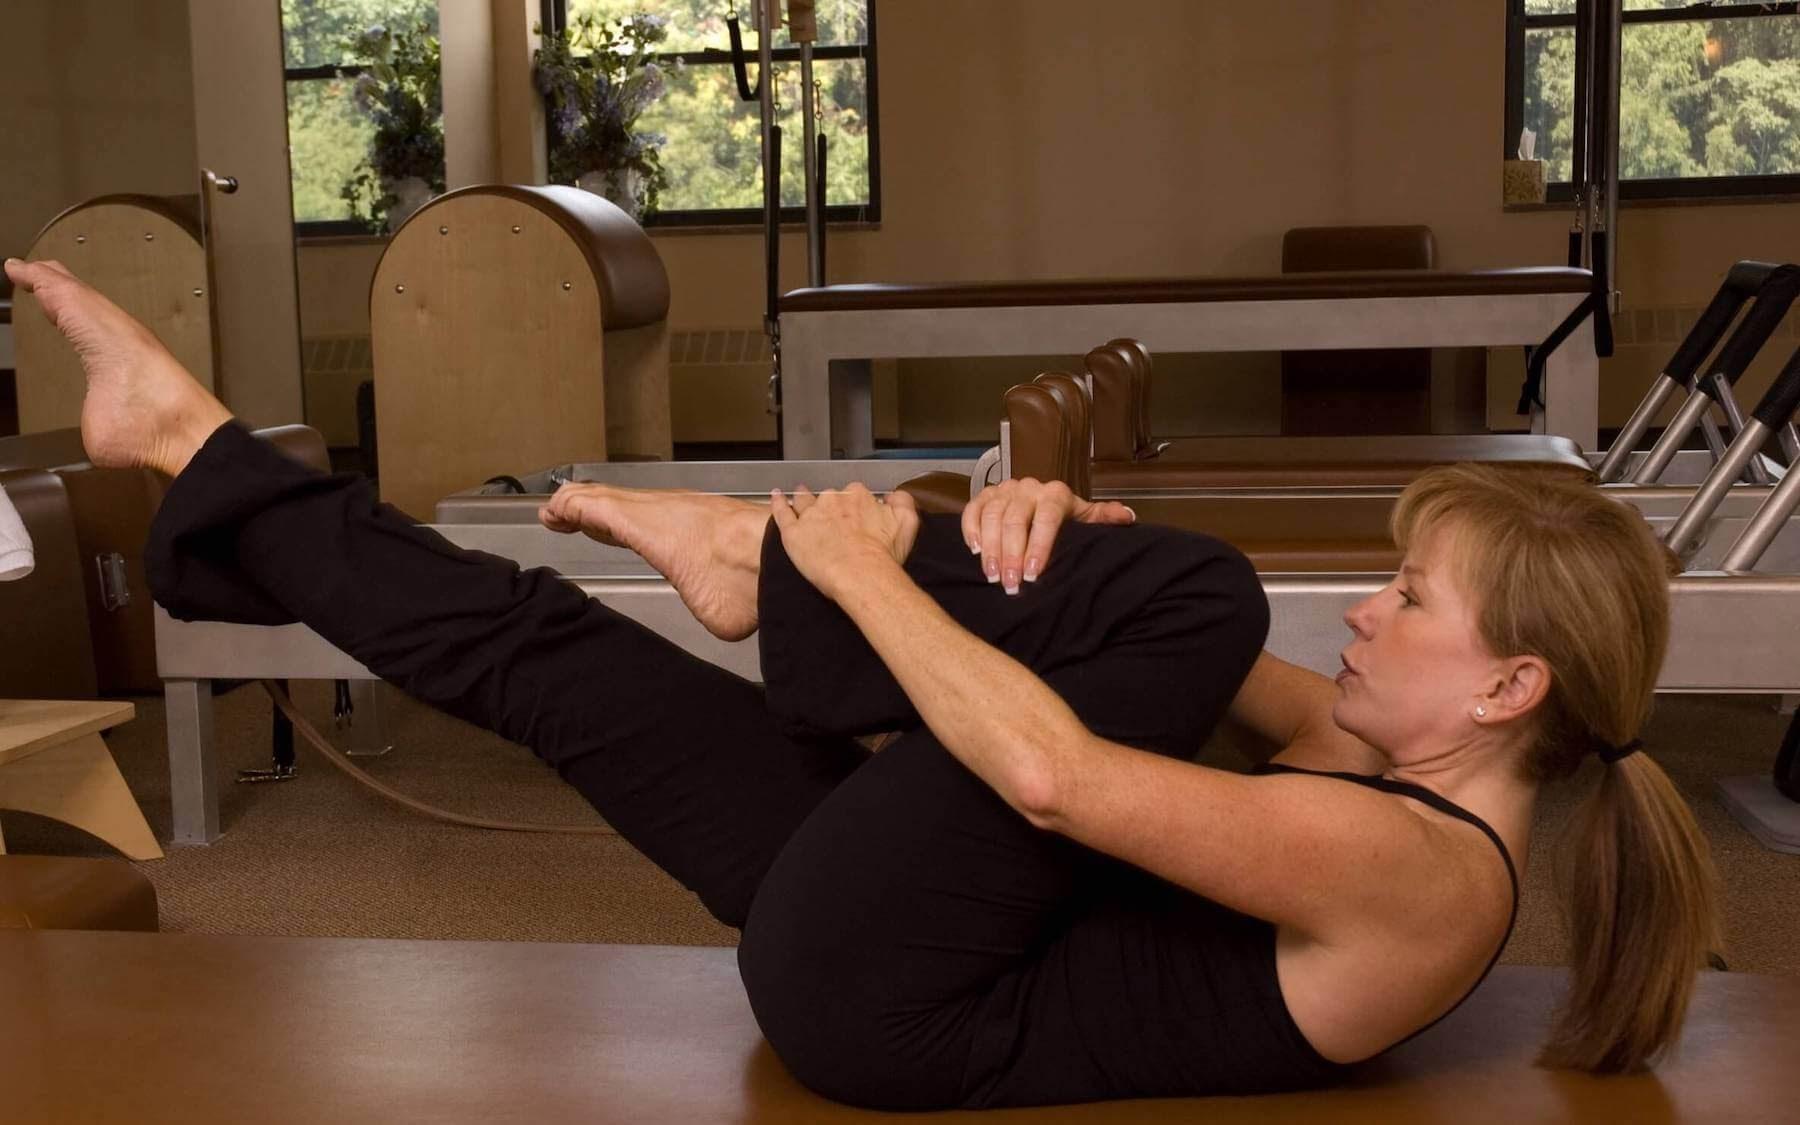 woman performing Pilates